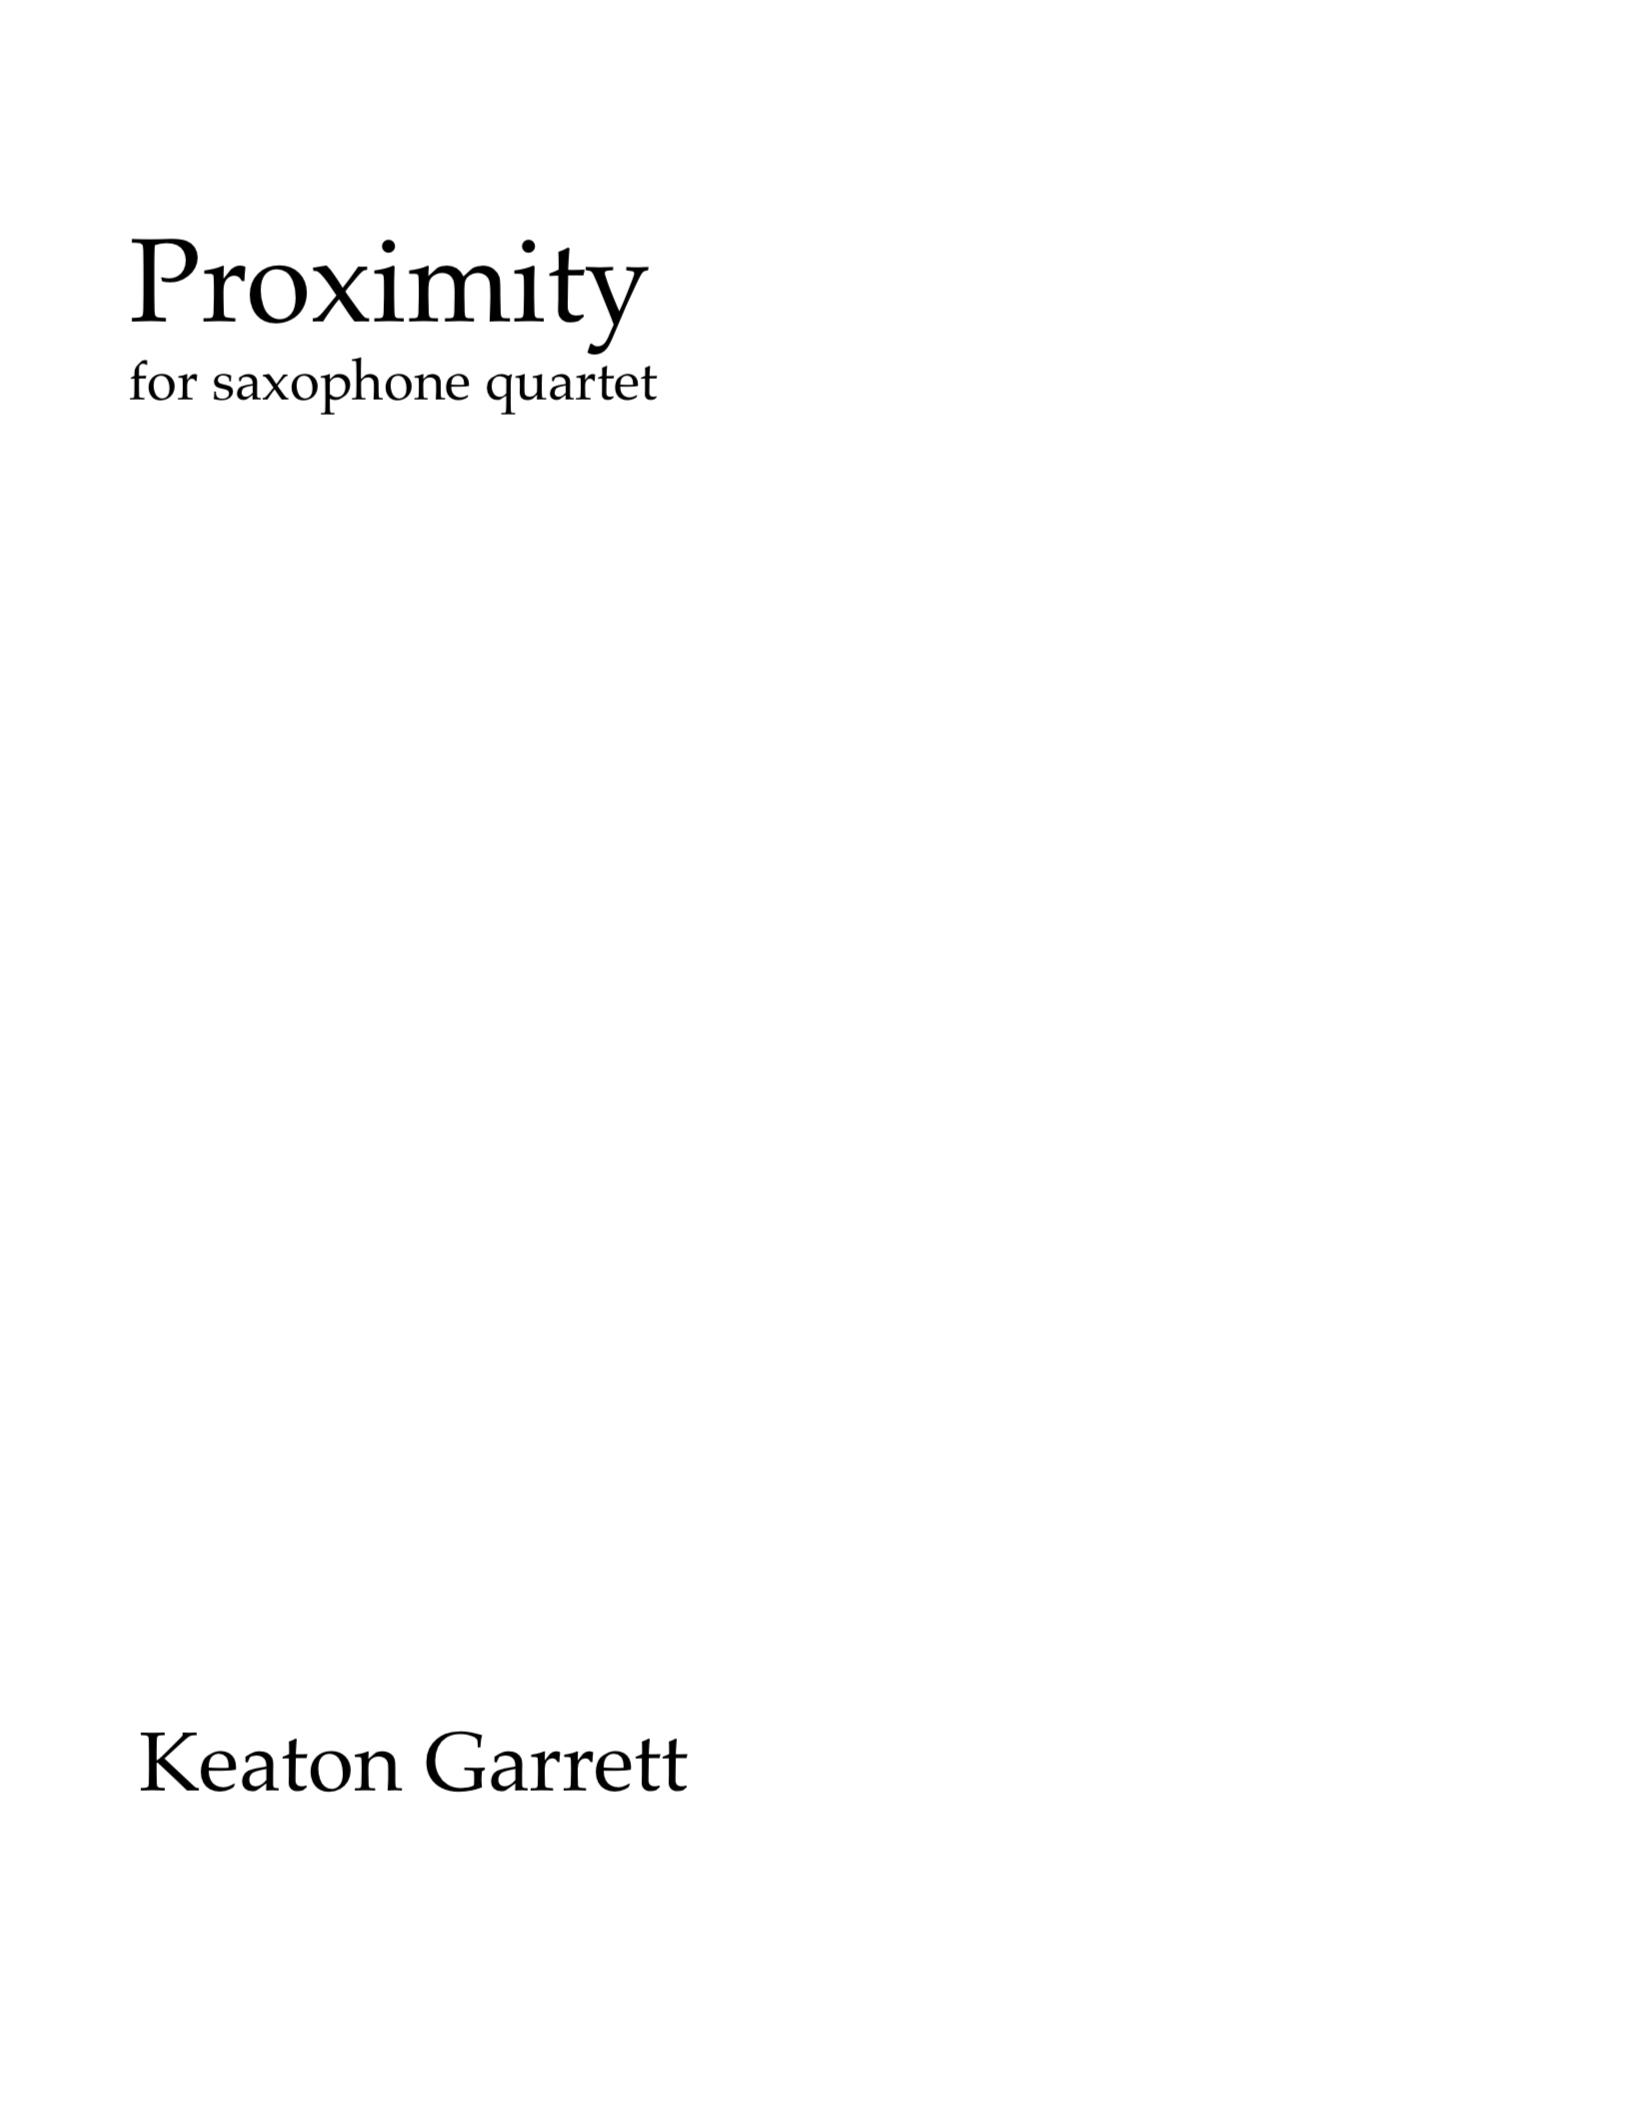 Proximity by Keaton Garrett